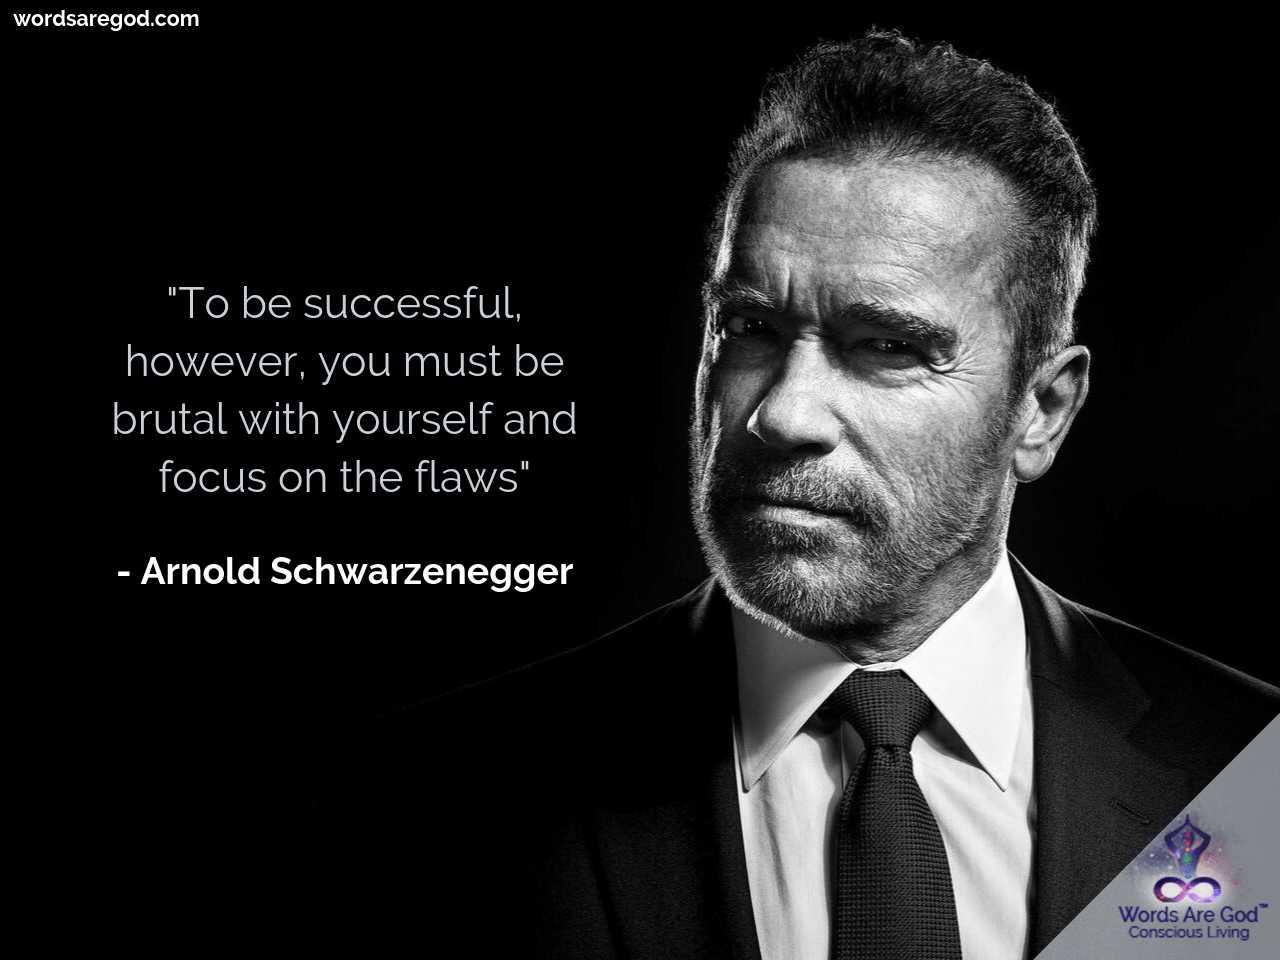 Arnold Schwarzenegger Life Quote